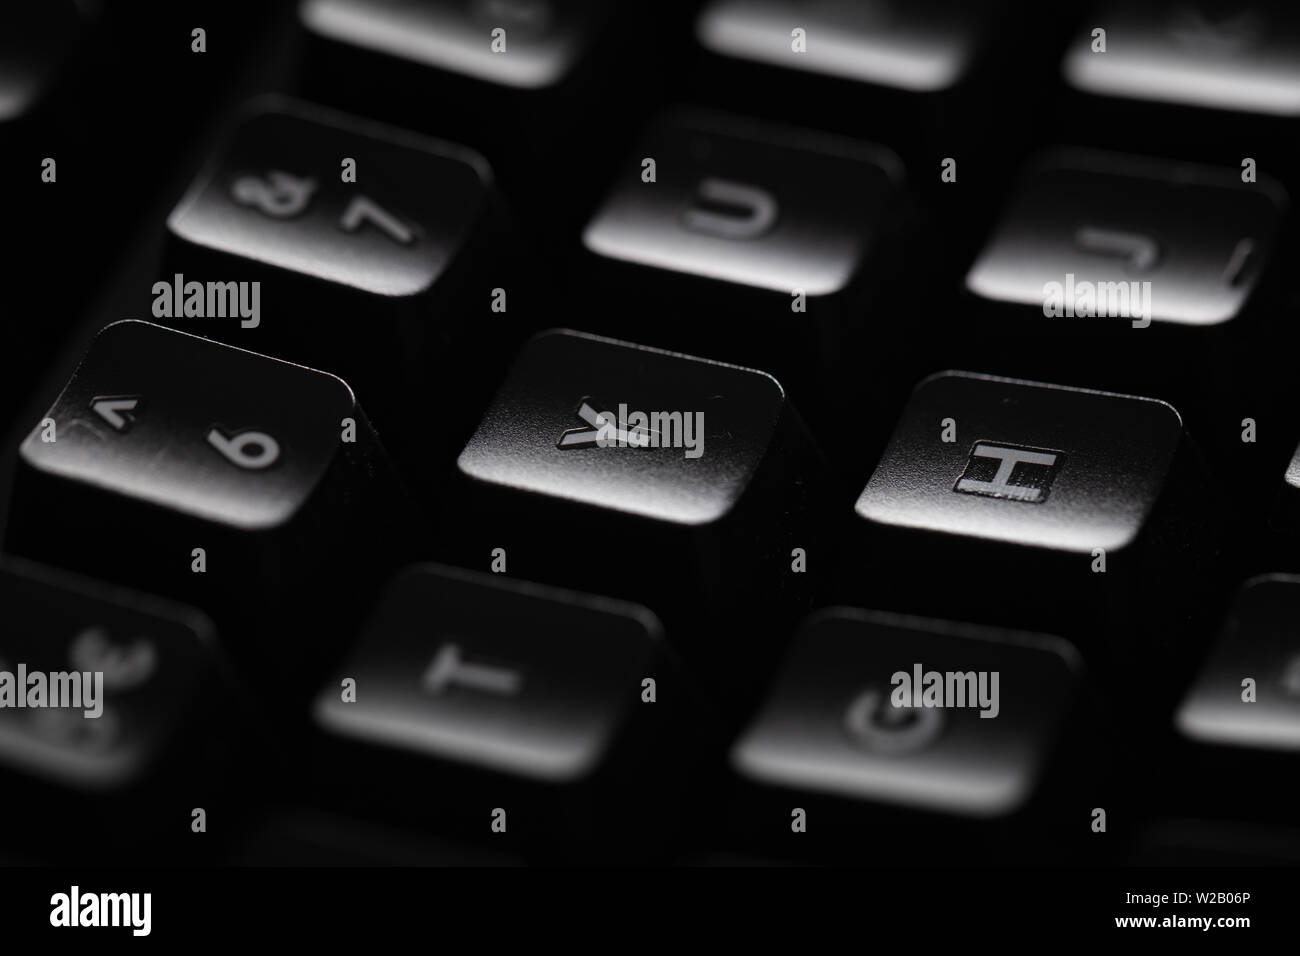 Close-up of a black keyboard - Stock Image